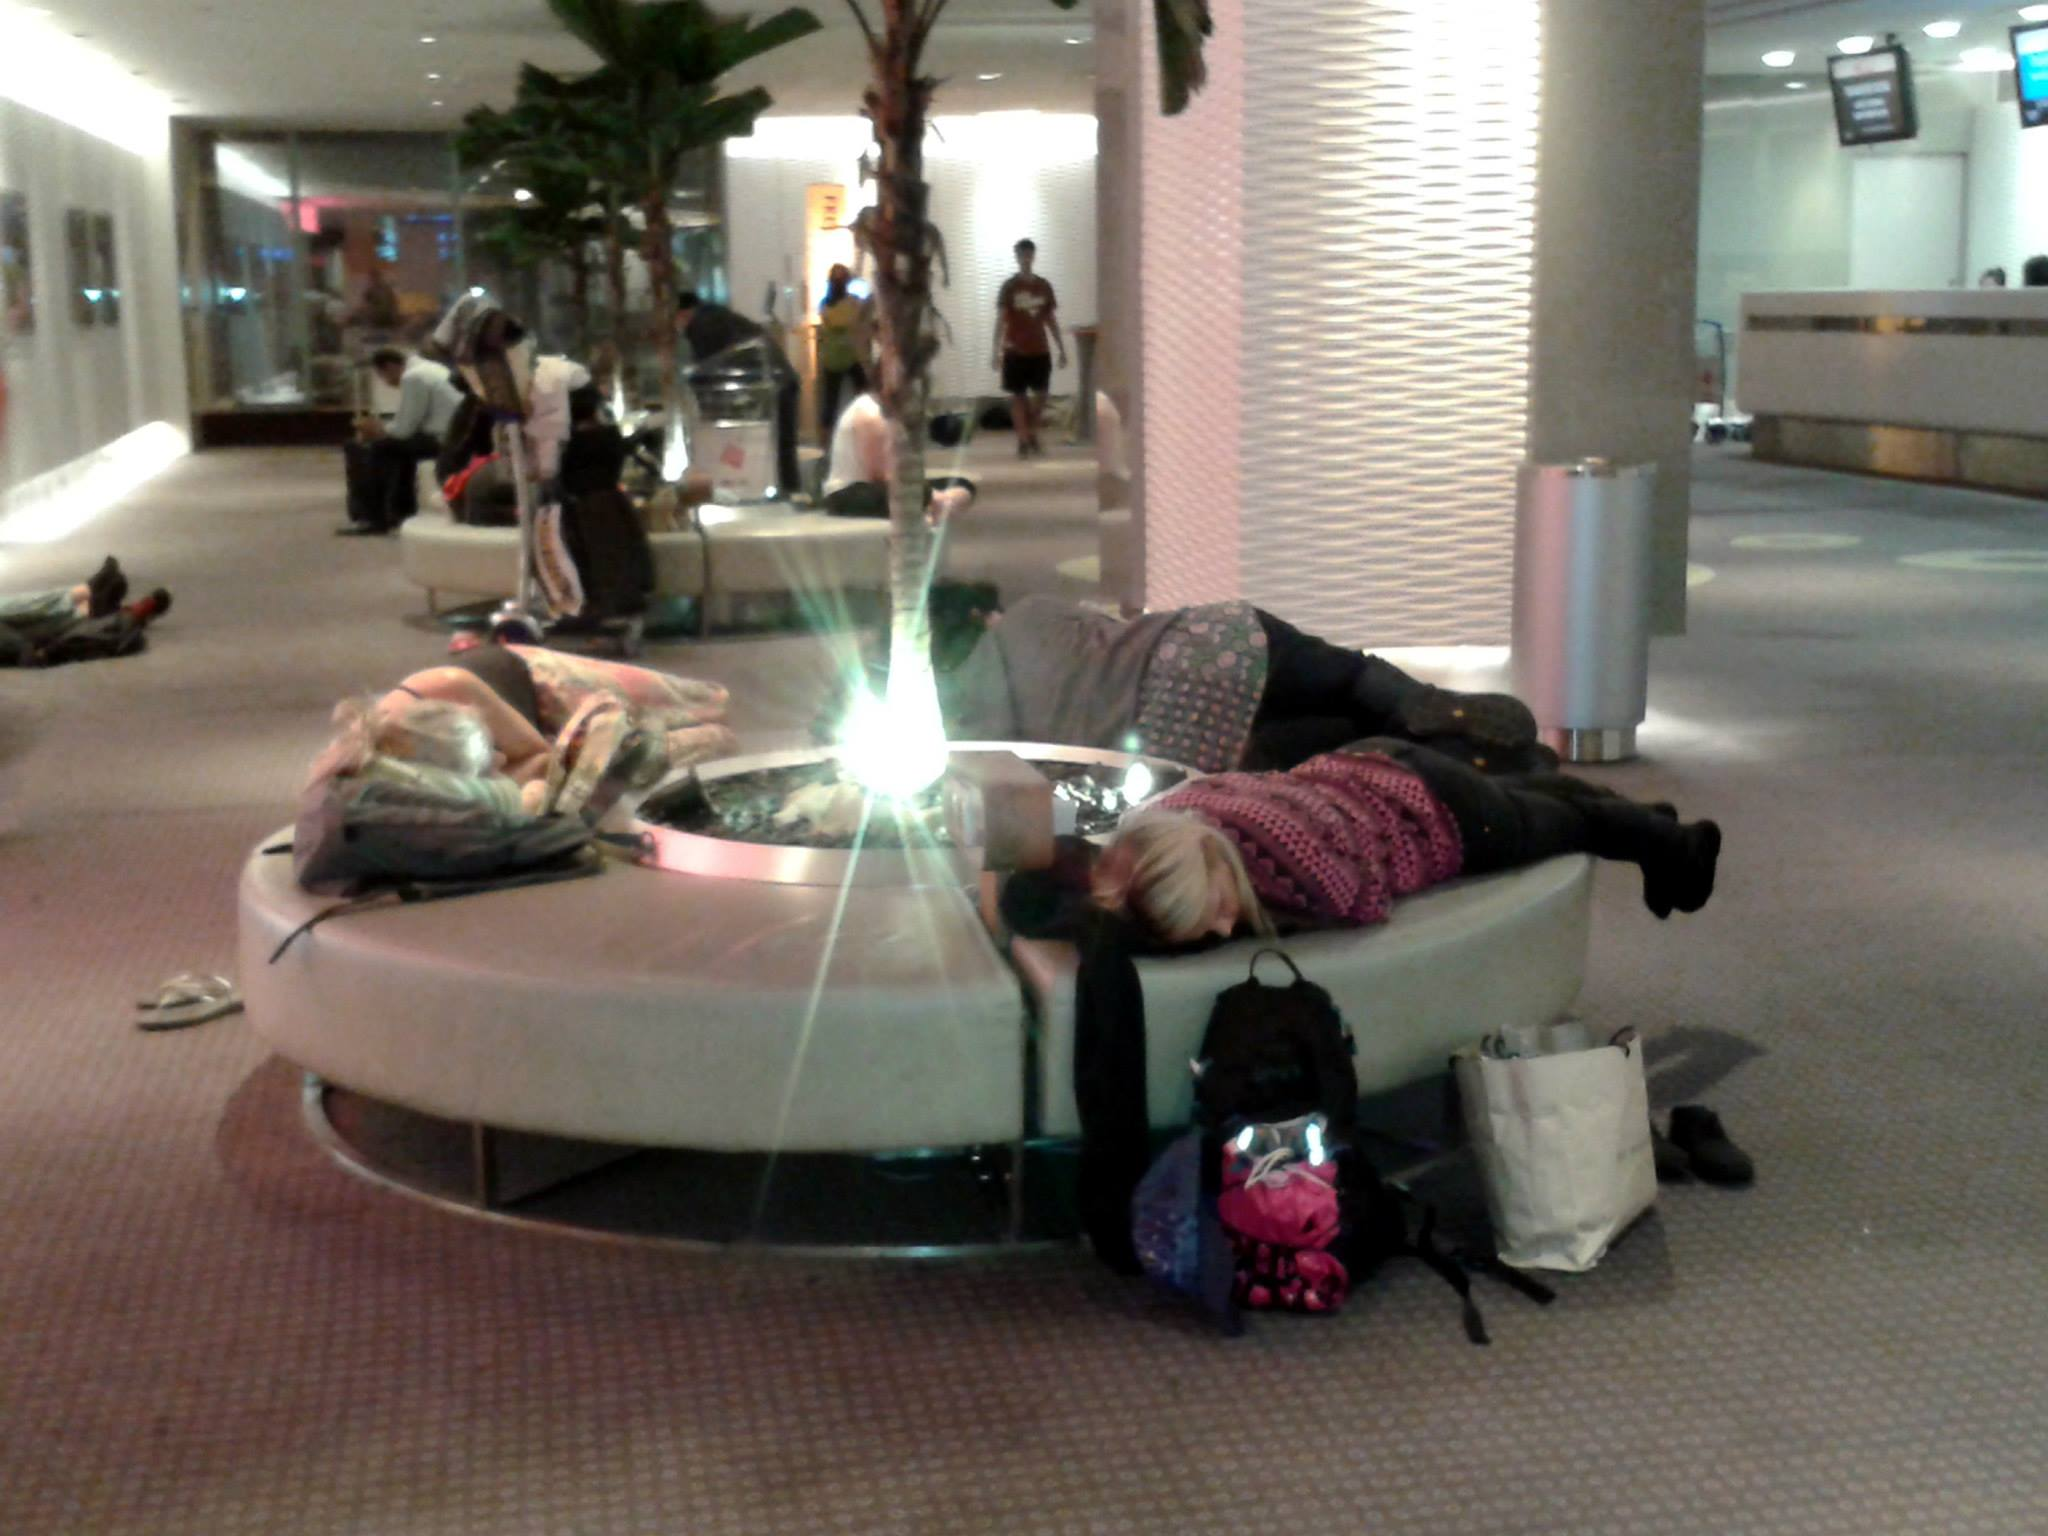 Travel Indonesia Blog: Sleeping Pale Folk at Singapore Airport